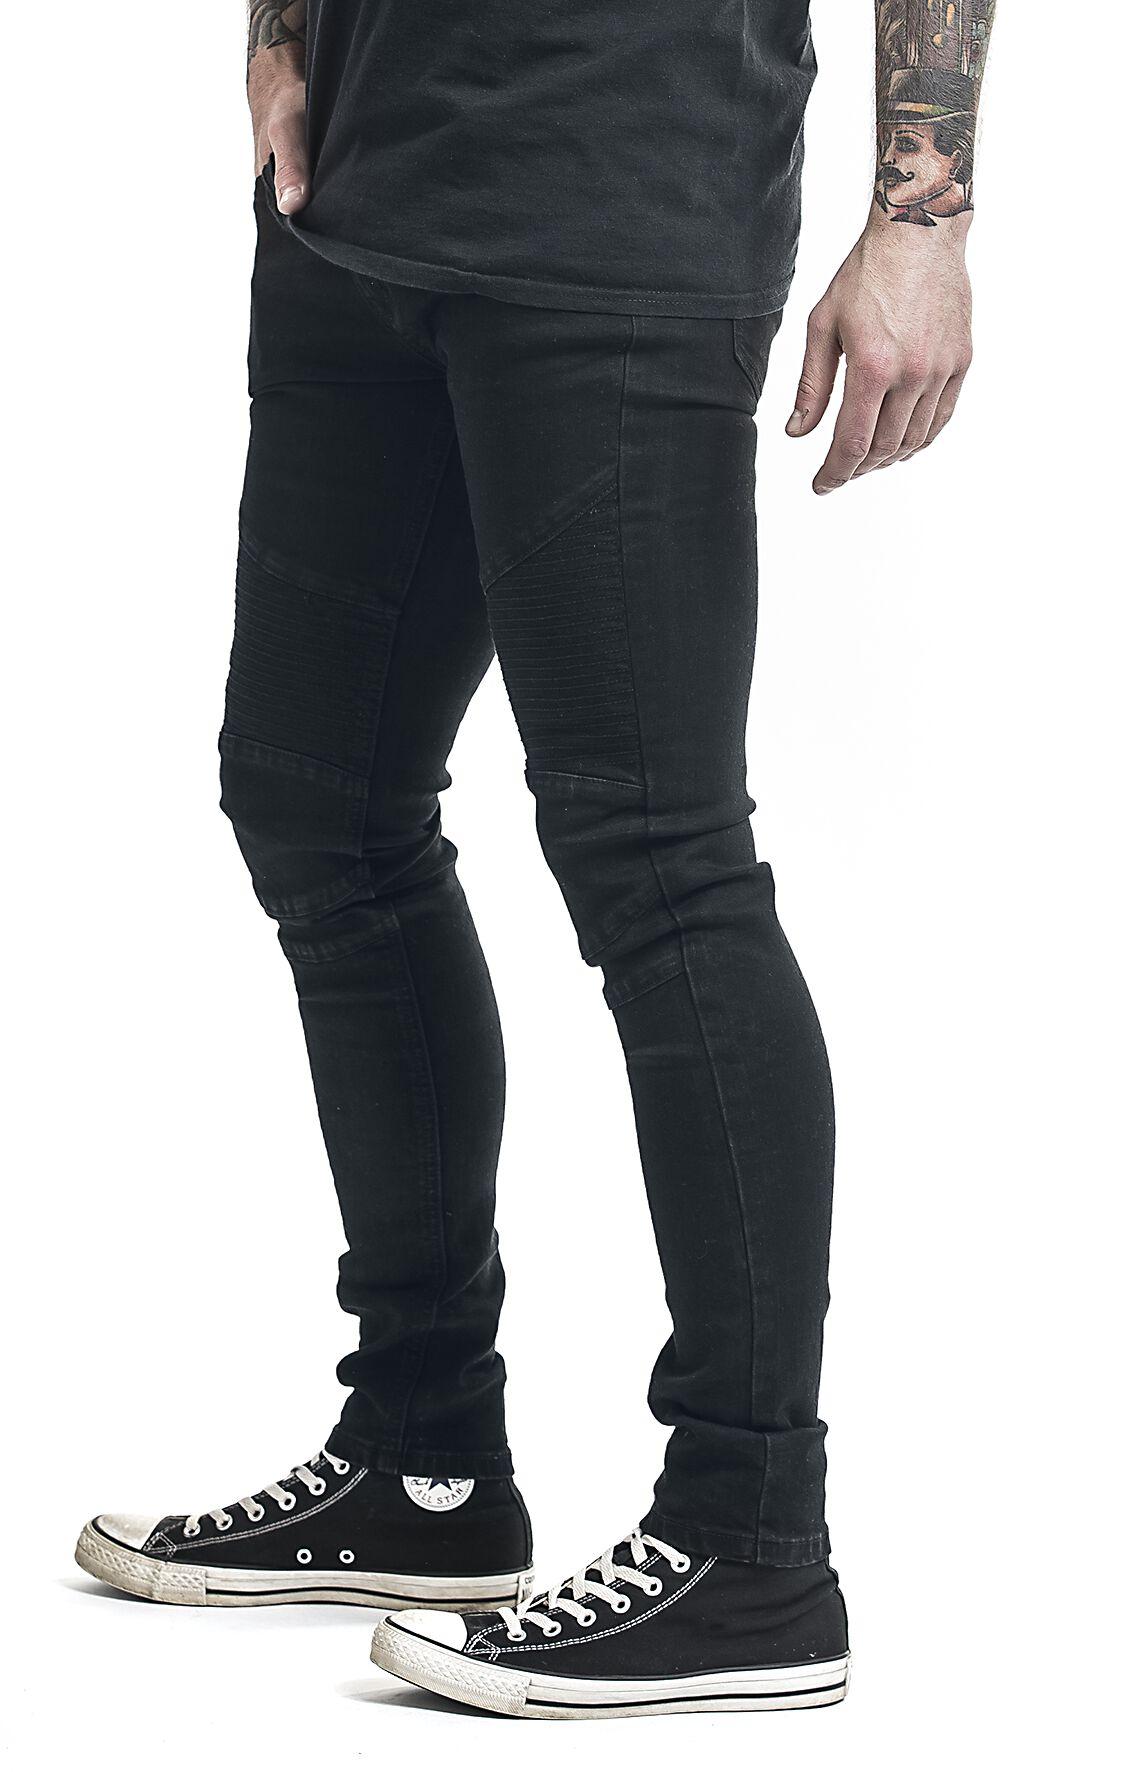 pantalon style motard forplay jean emp. Black Bedroom Furniture Sets. Home Design Ideas